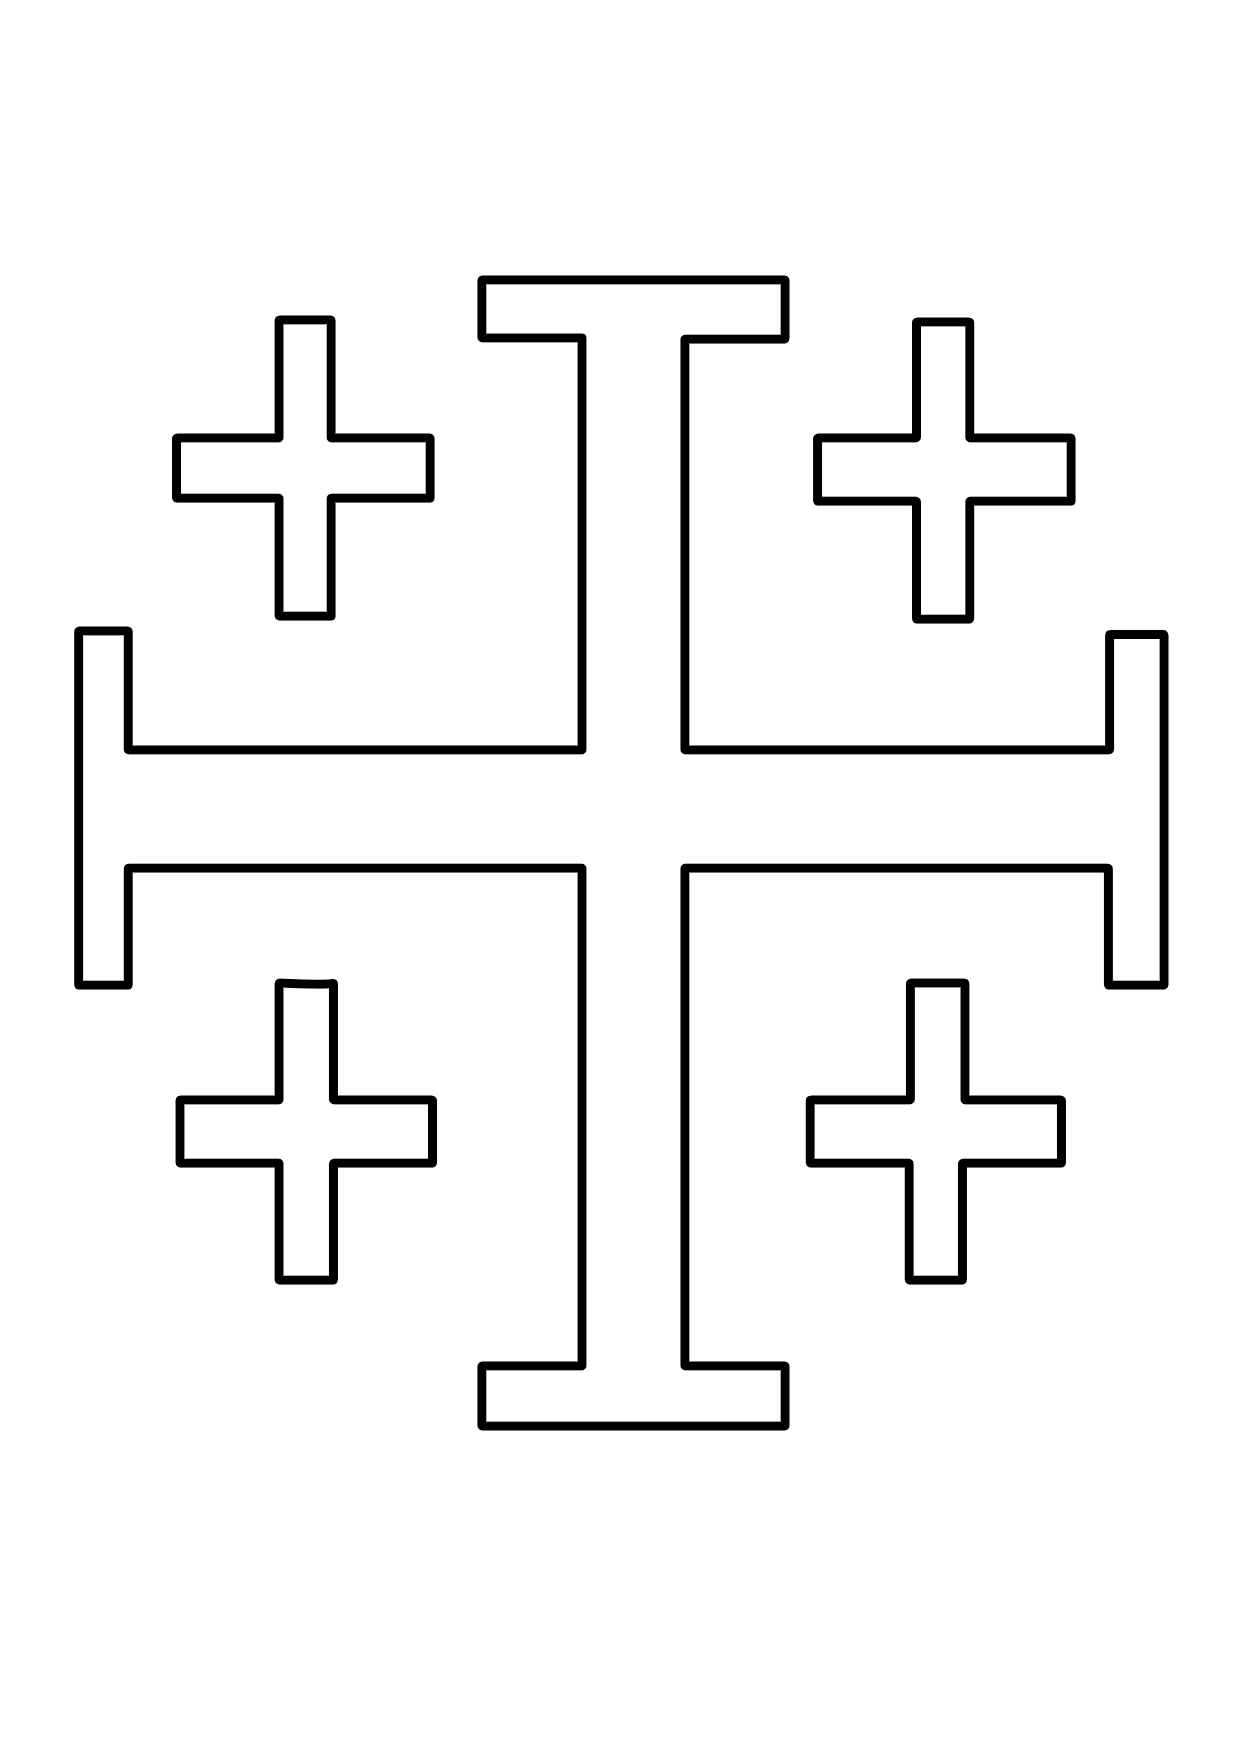 Cruz de Jerusalén para colorear